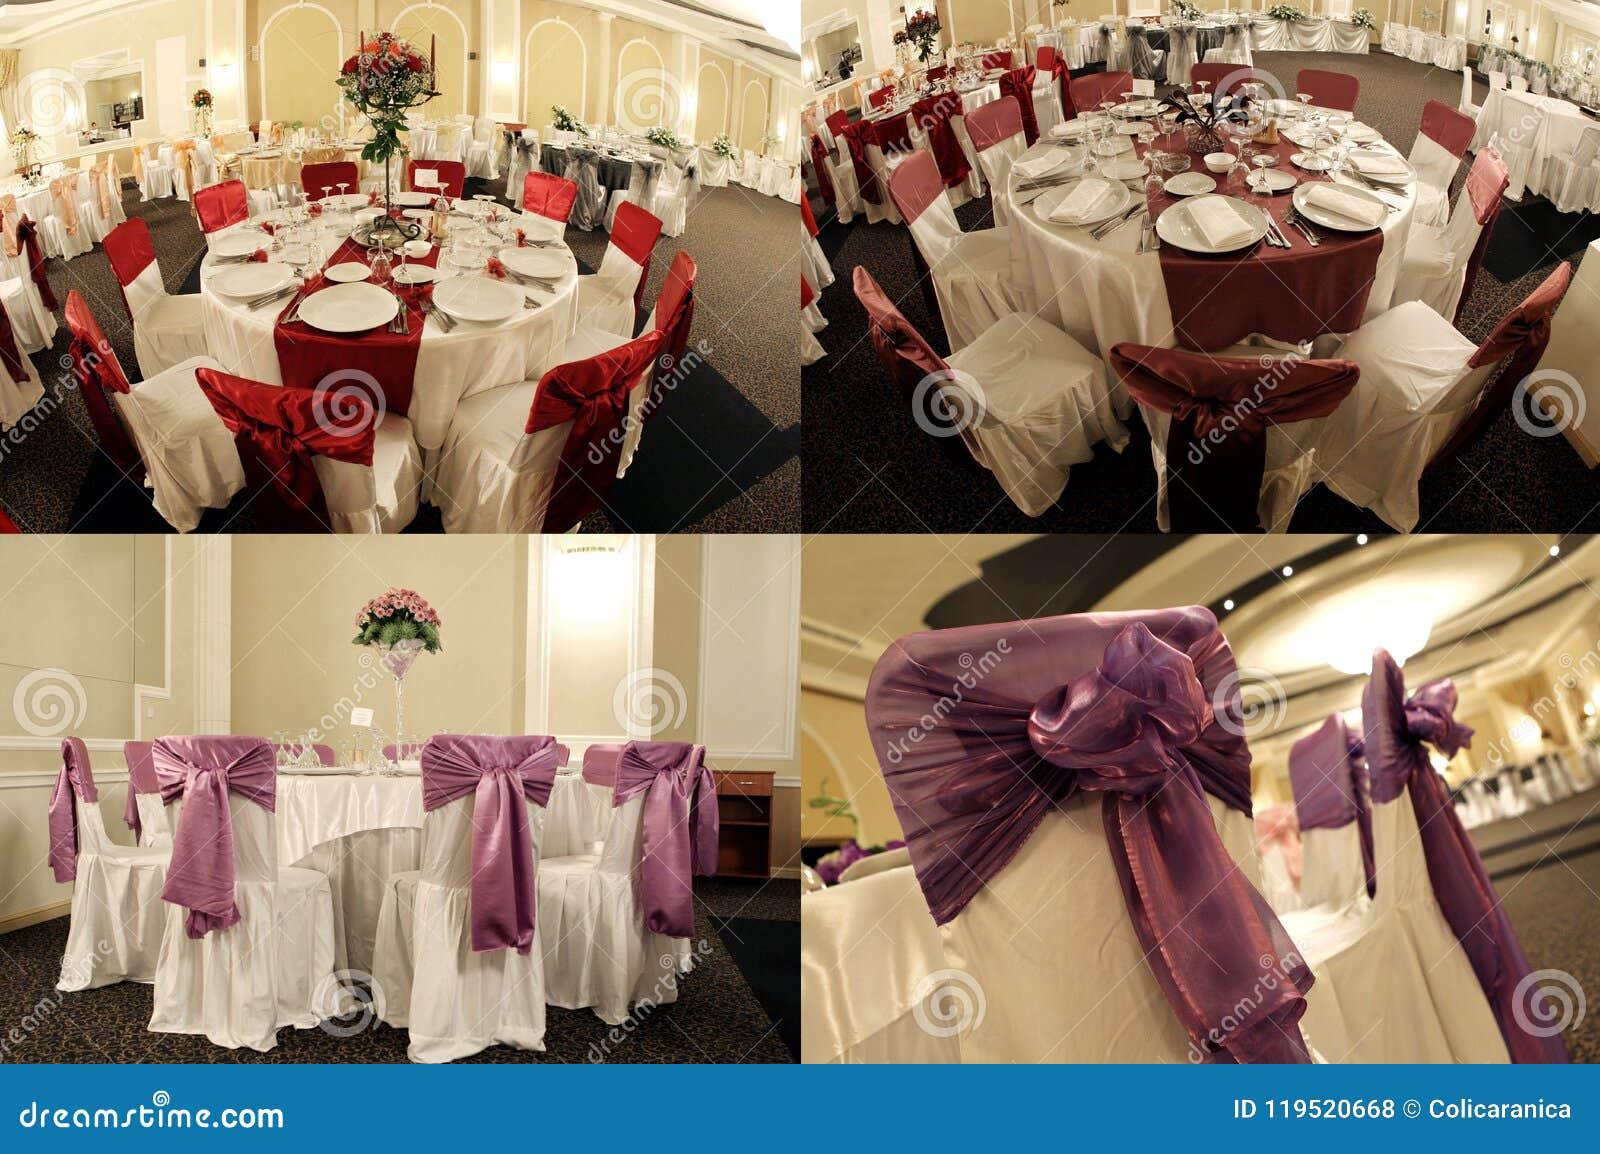 Tables in a wedding ballroom, multicam, screen split in four parts, grid 2x2